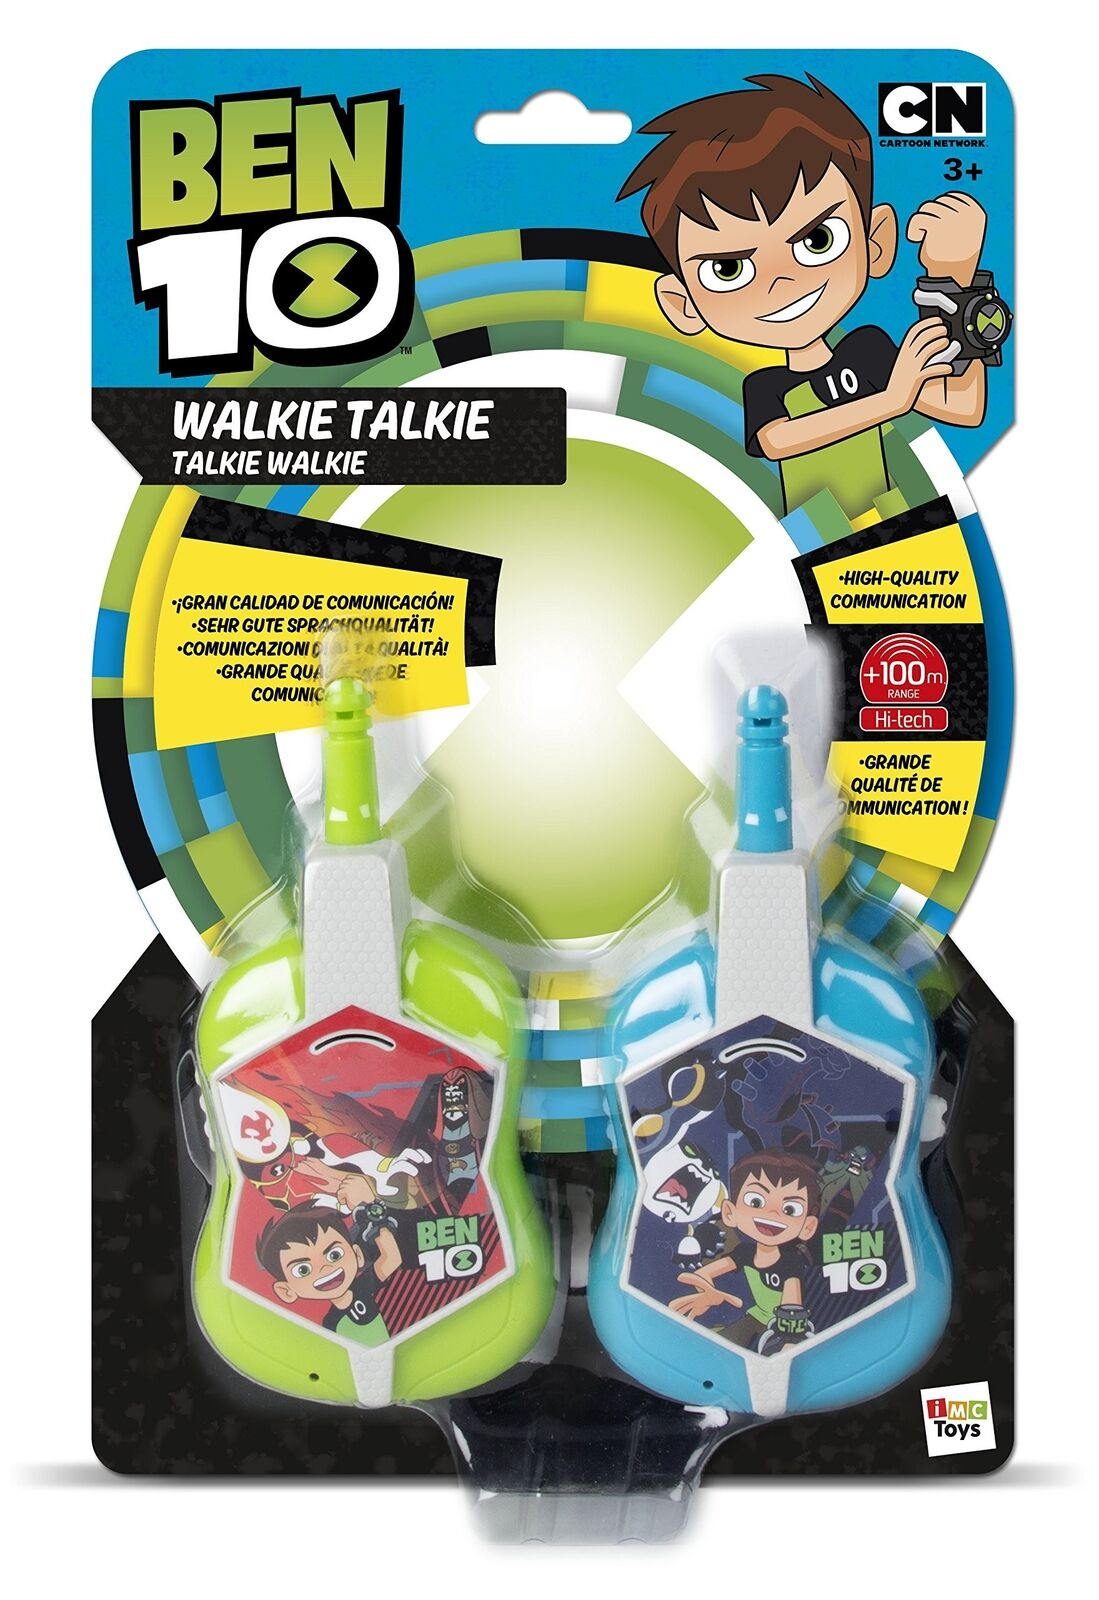 Ben 10 promänadie Talkie (IMC leksaker 70680)